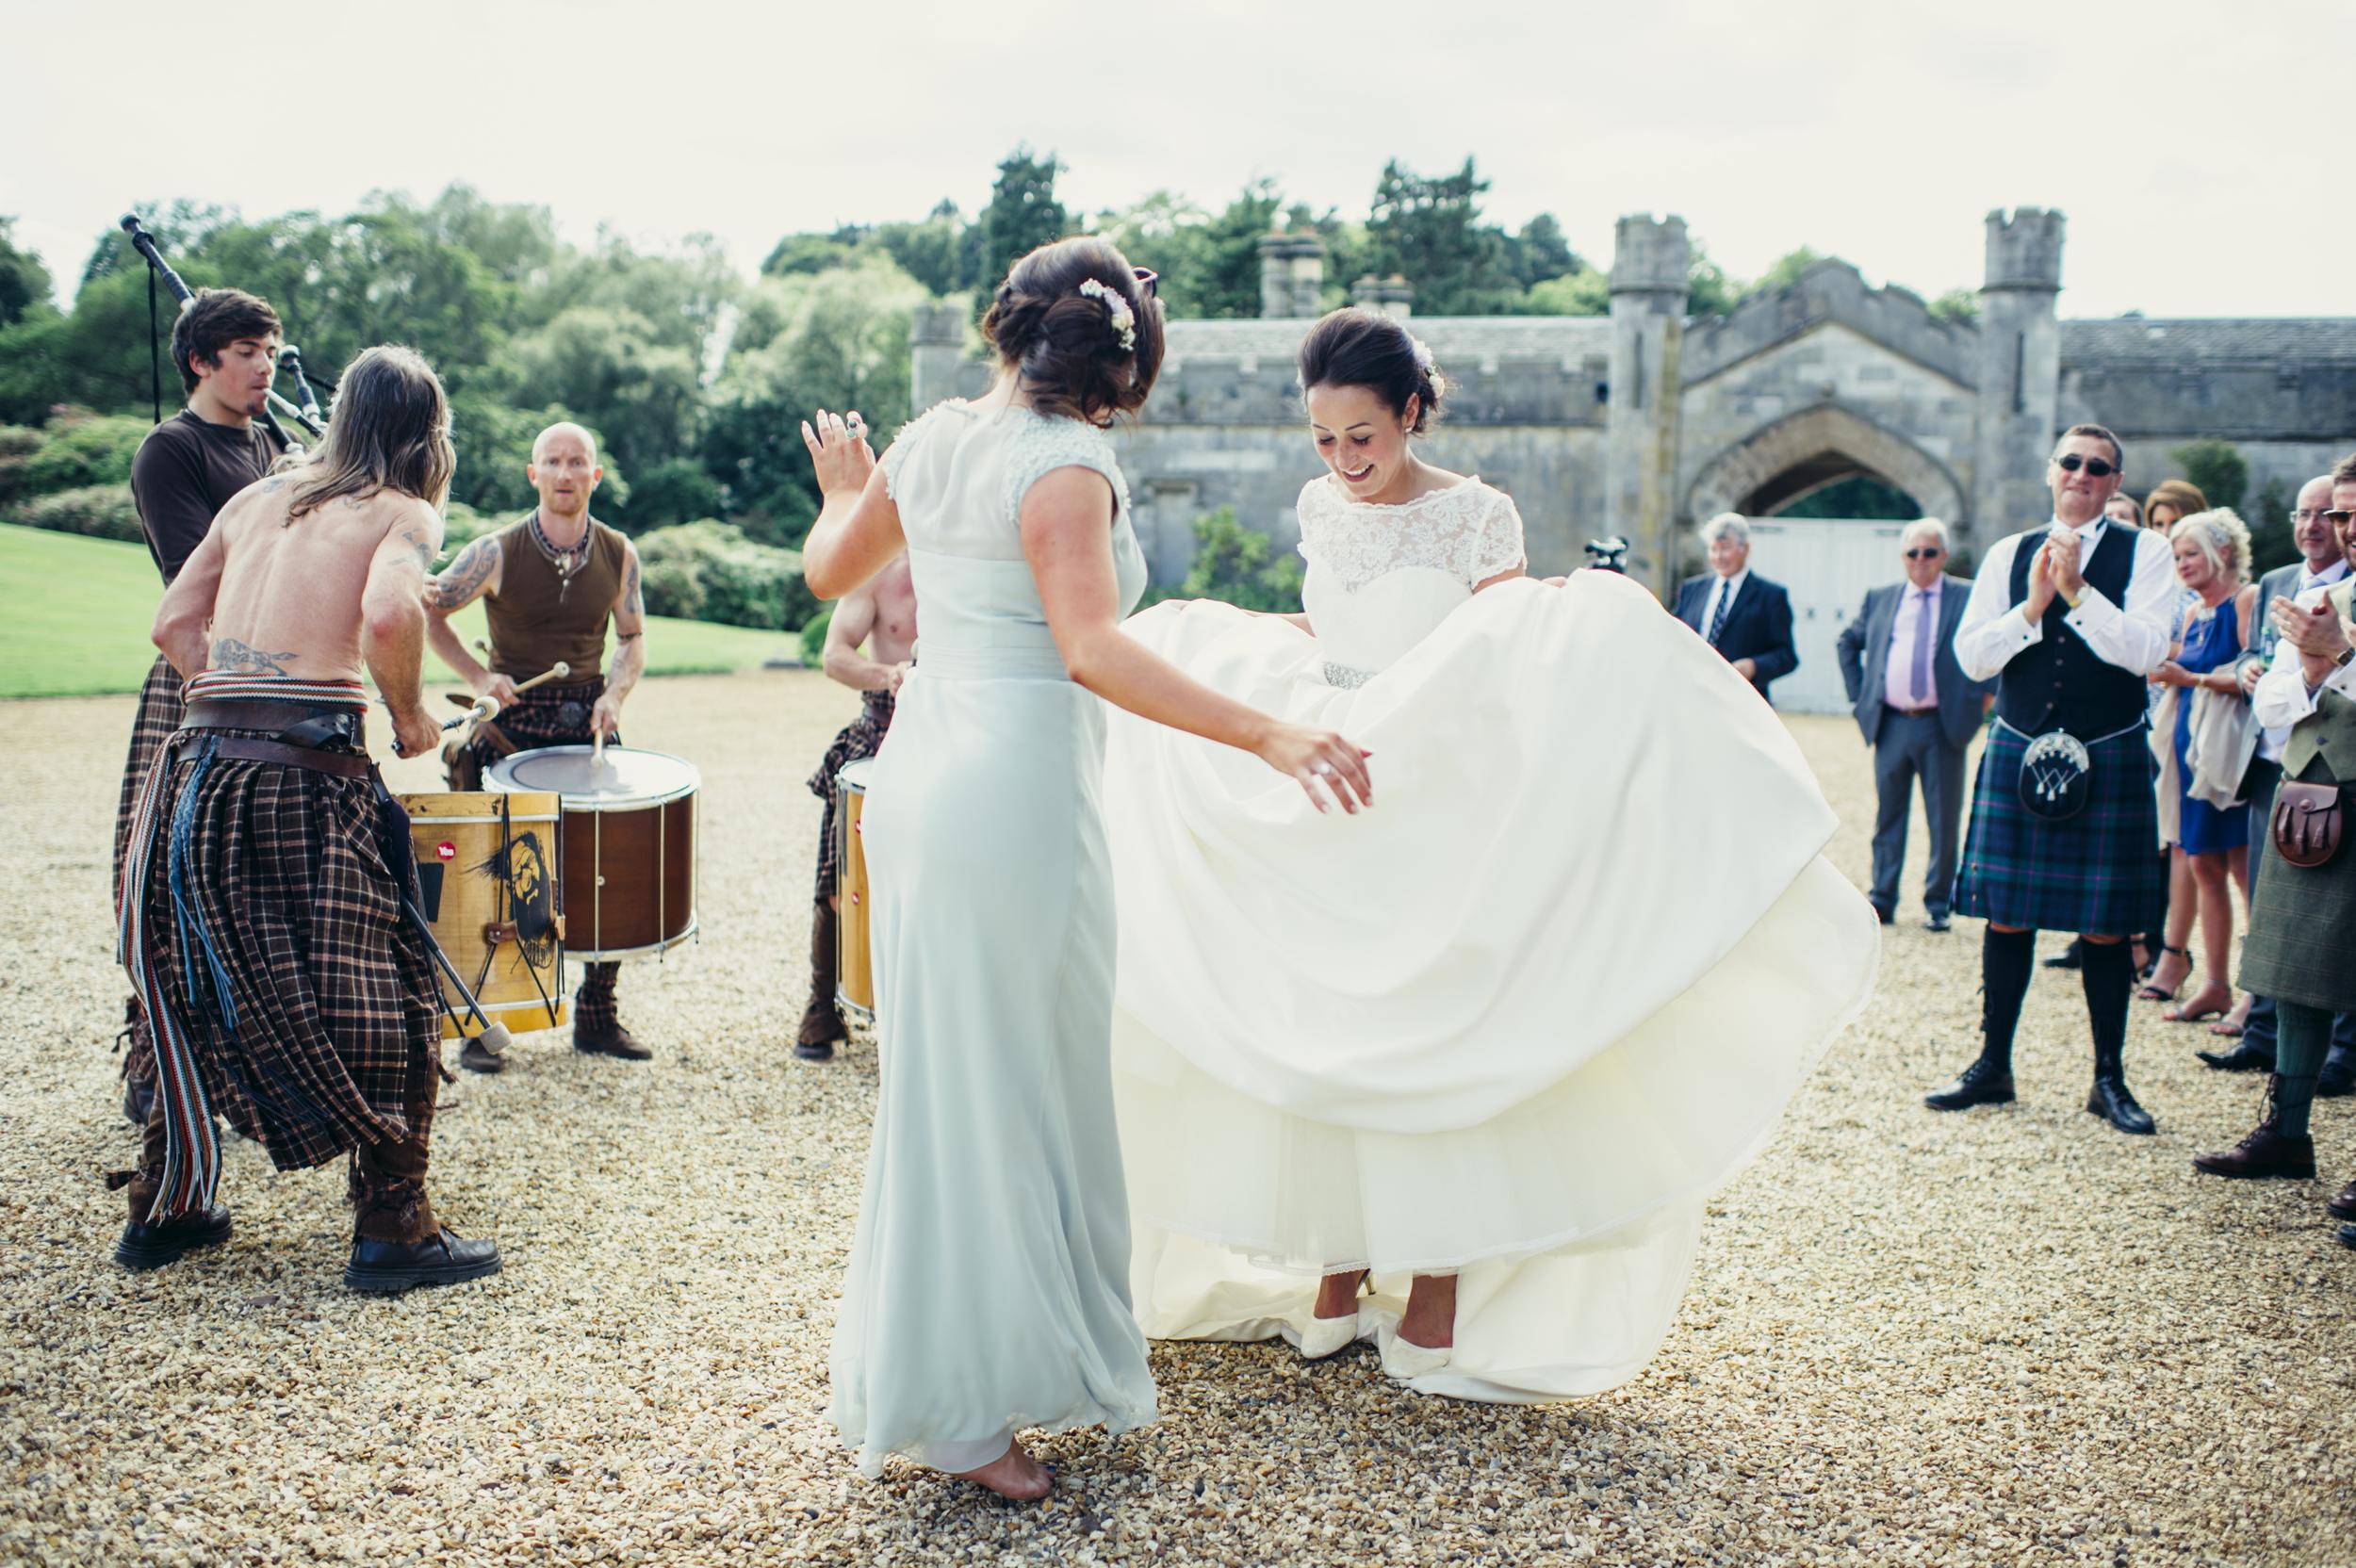 0147-lisa-devine-alternative-creative-wedding-photography-glasgow-edinburgh.JPG